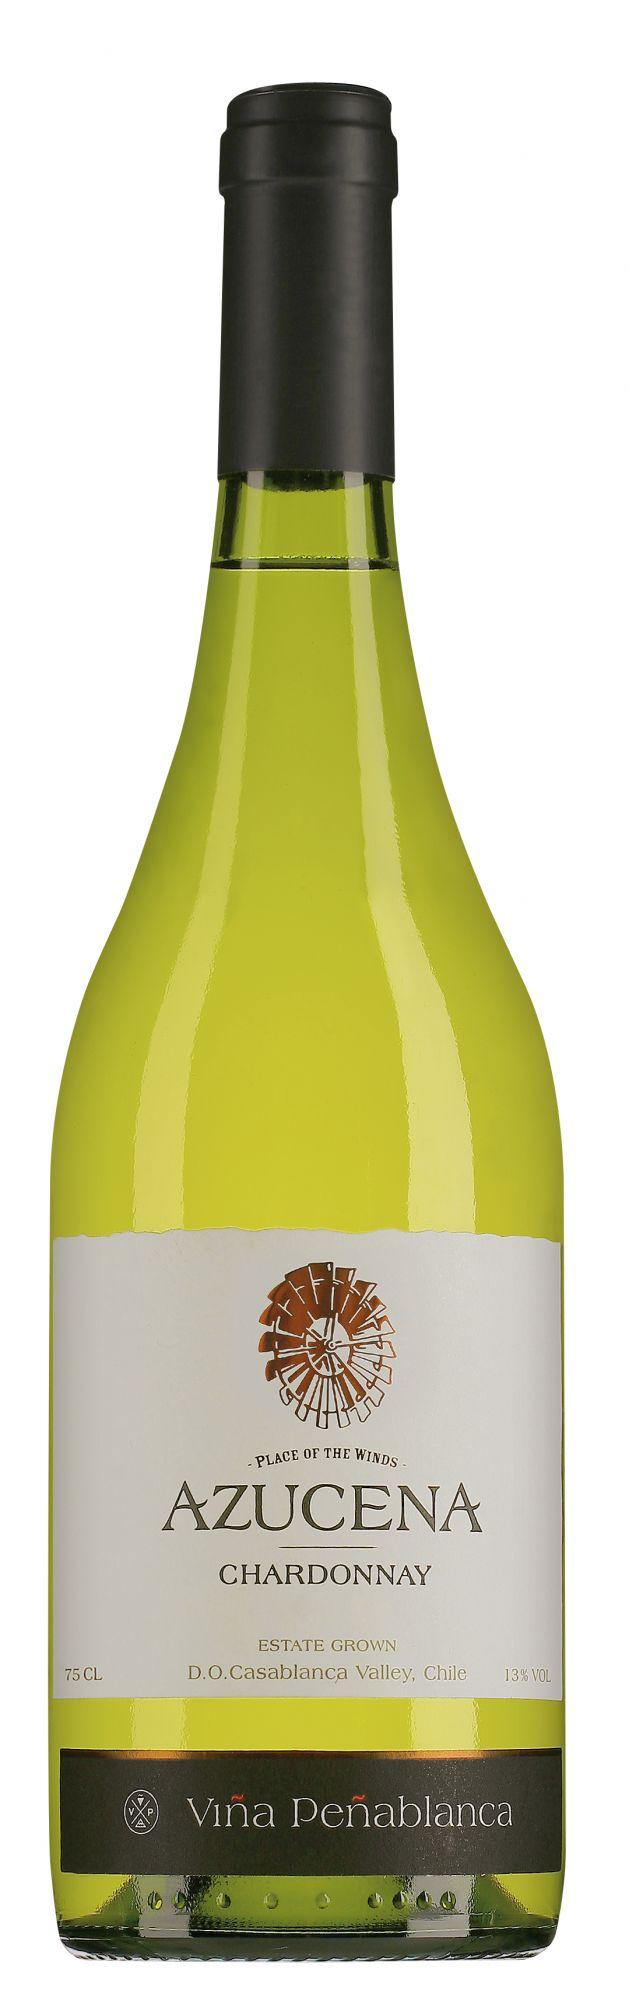 Viña Peñablanca Azucena Coastal Chardonnay